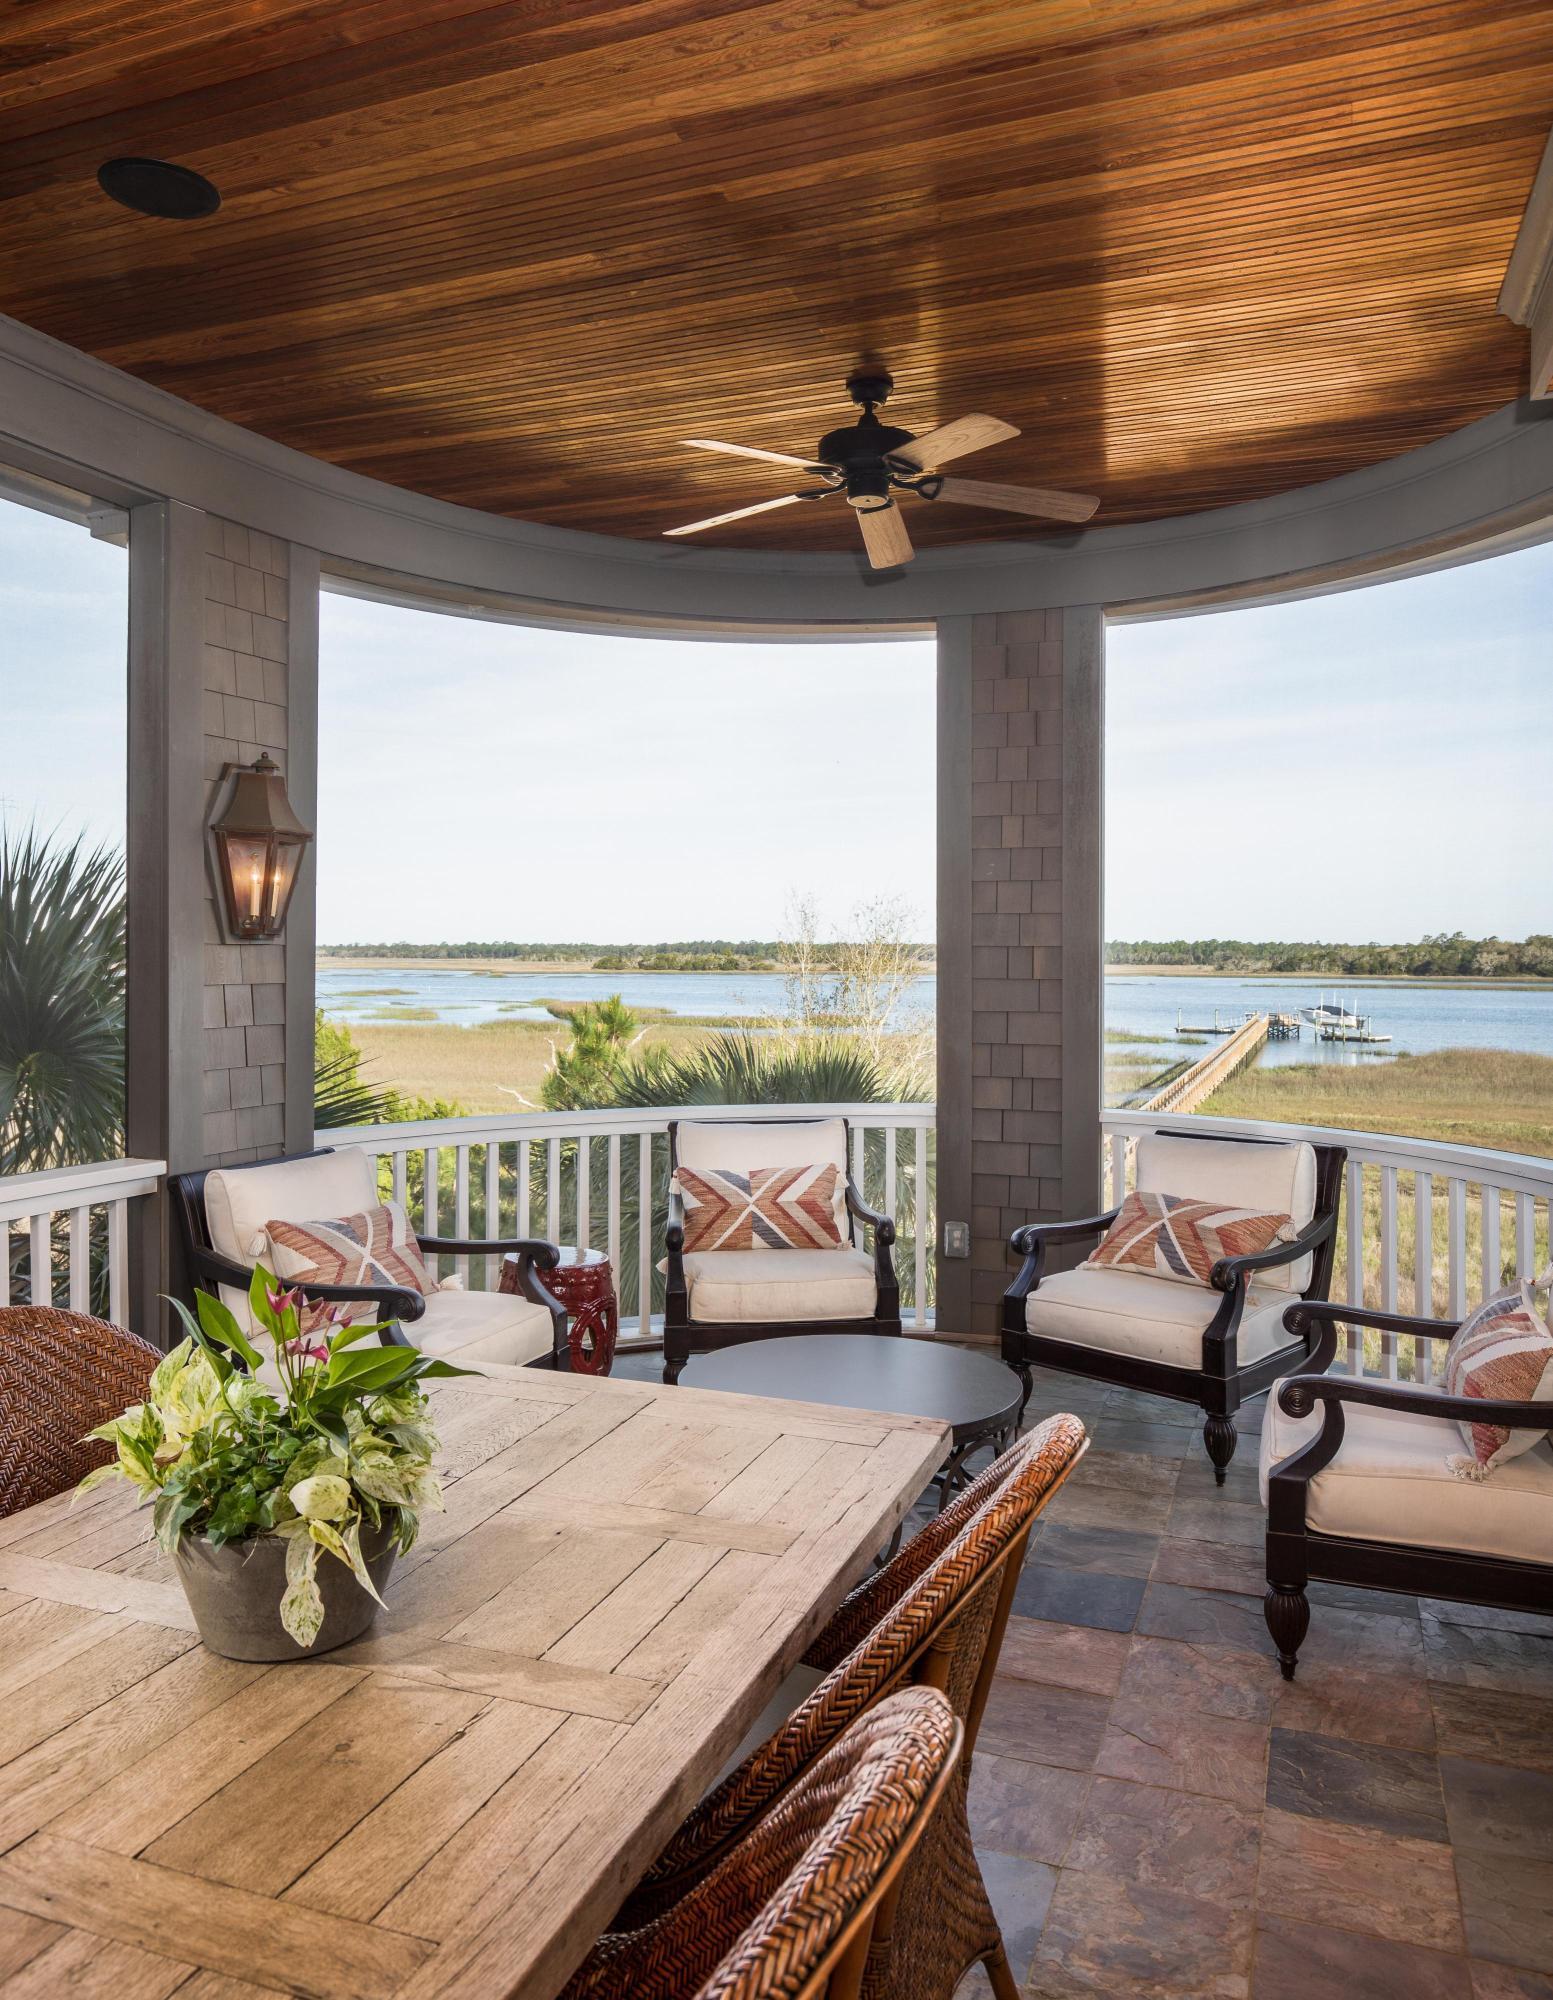 Rhetts Bluff Homes For Sale - 51 River Marsh, Kiawah Island, SC - 33